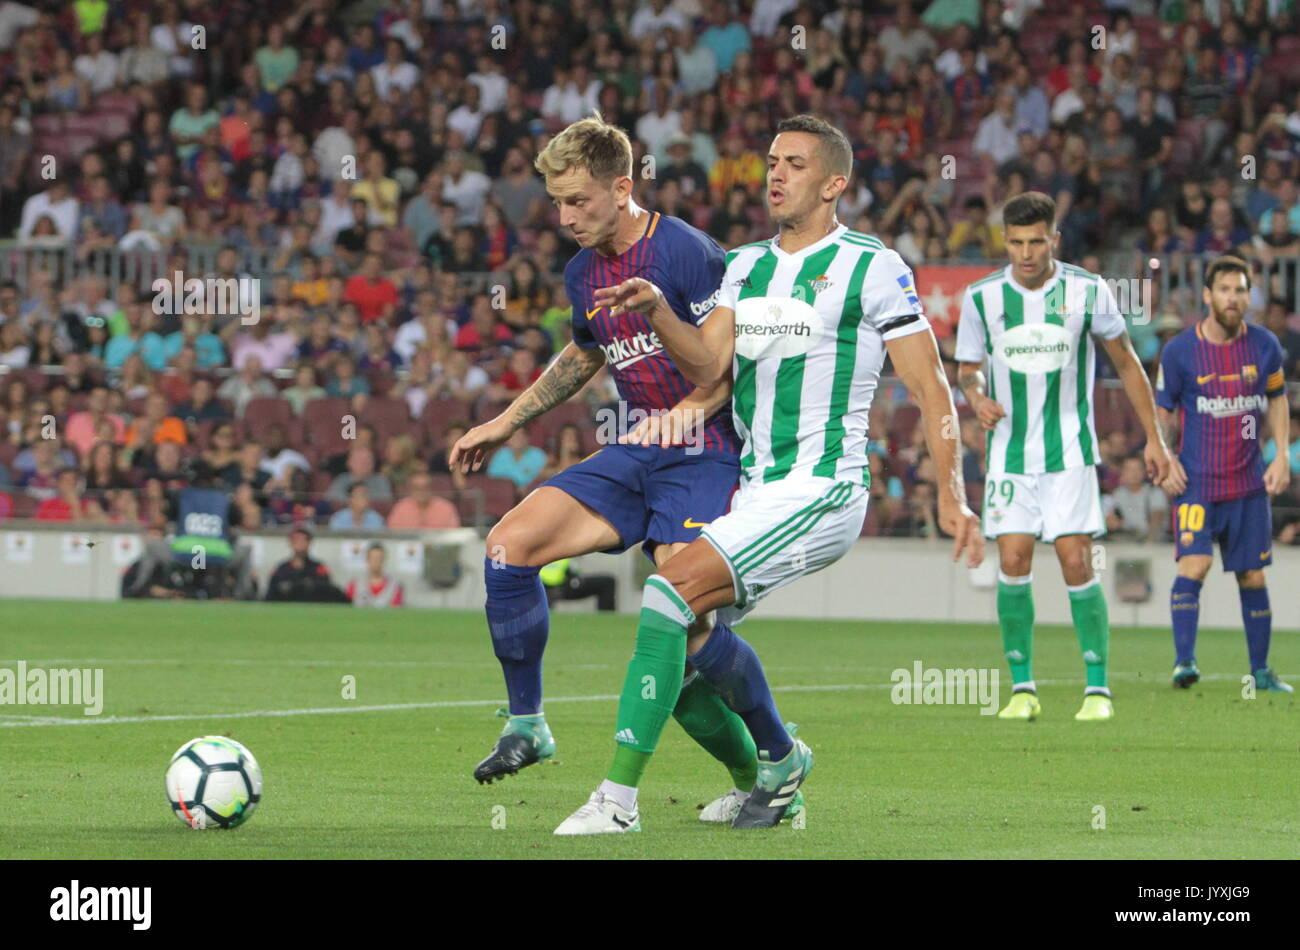 Rakitic in action during La Liga game between FC Barcelona v Betis at Camp Nou - Stock Image